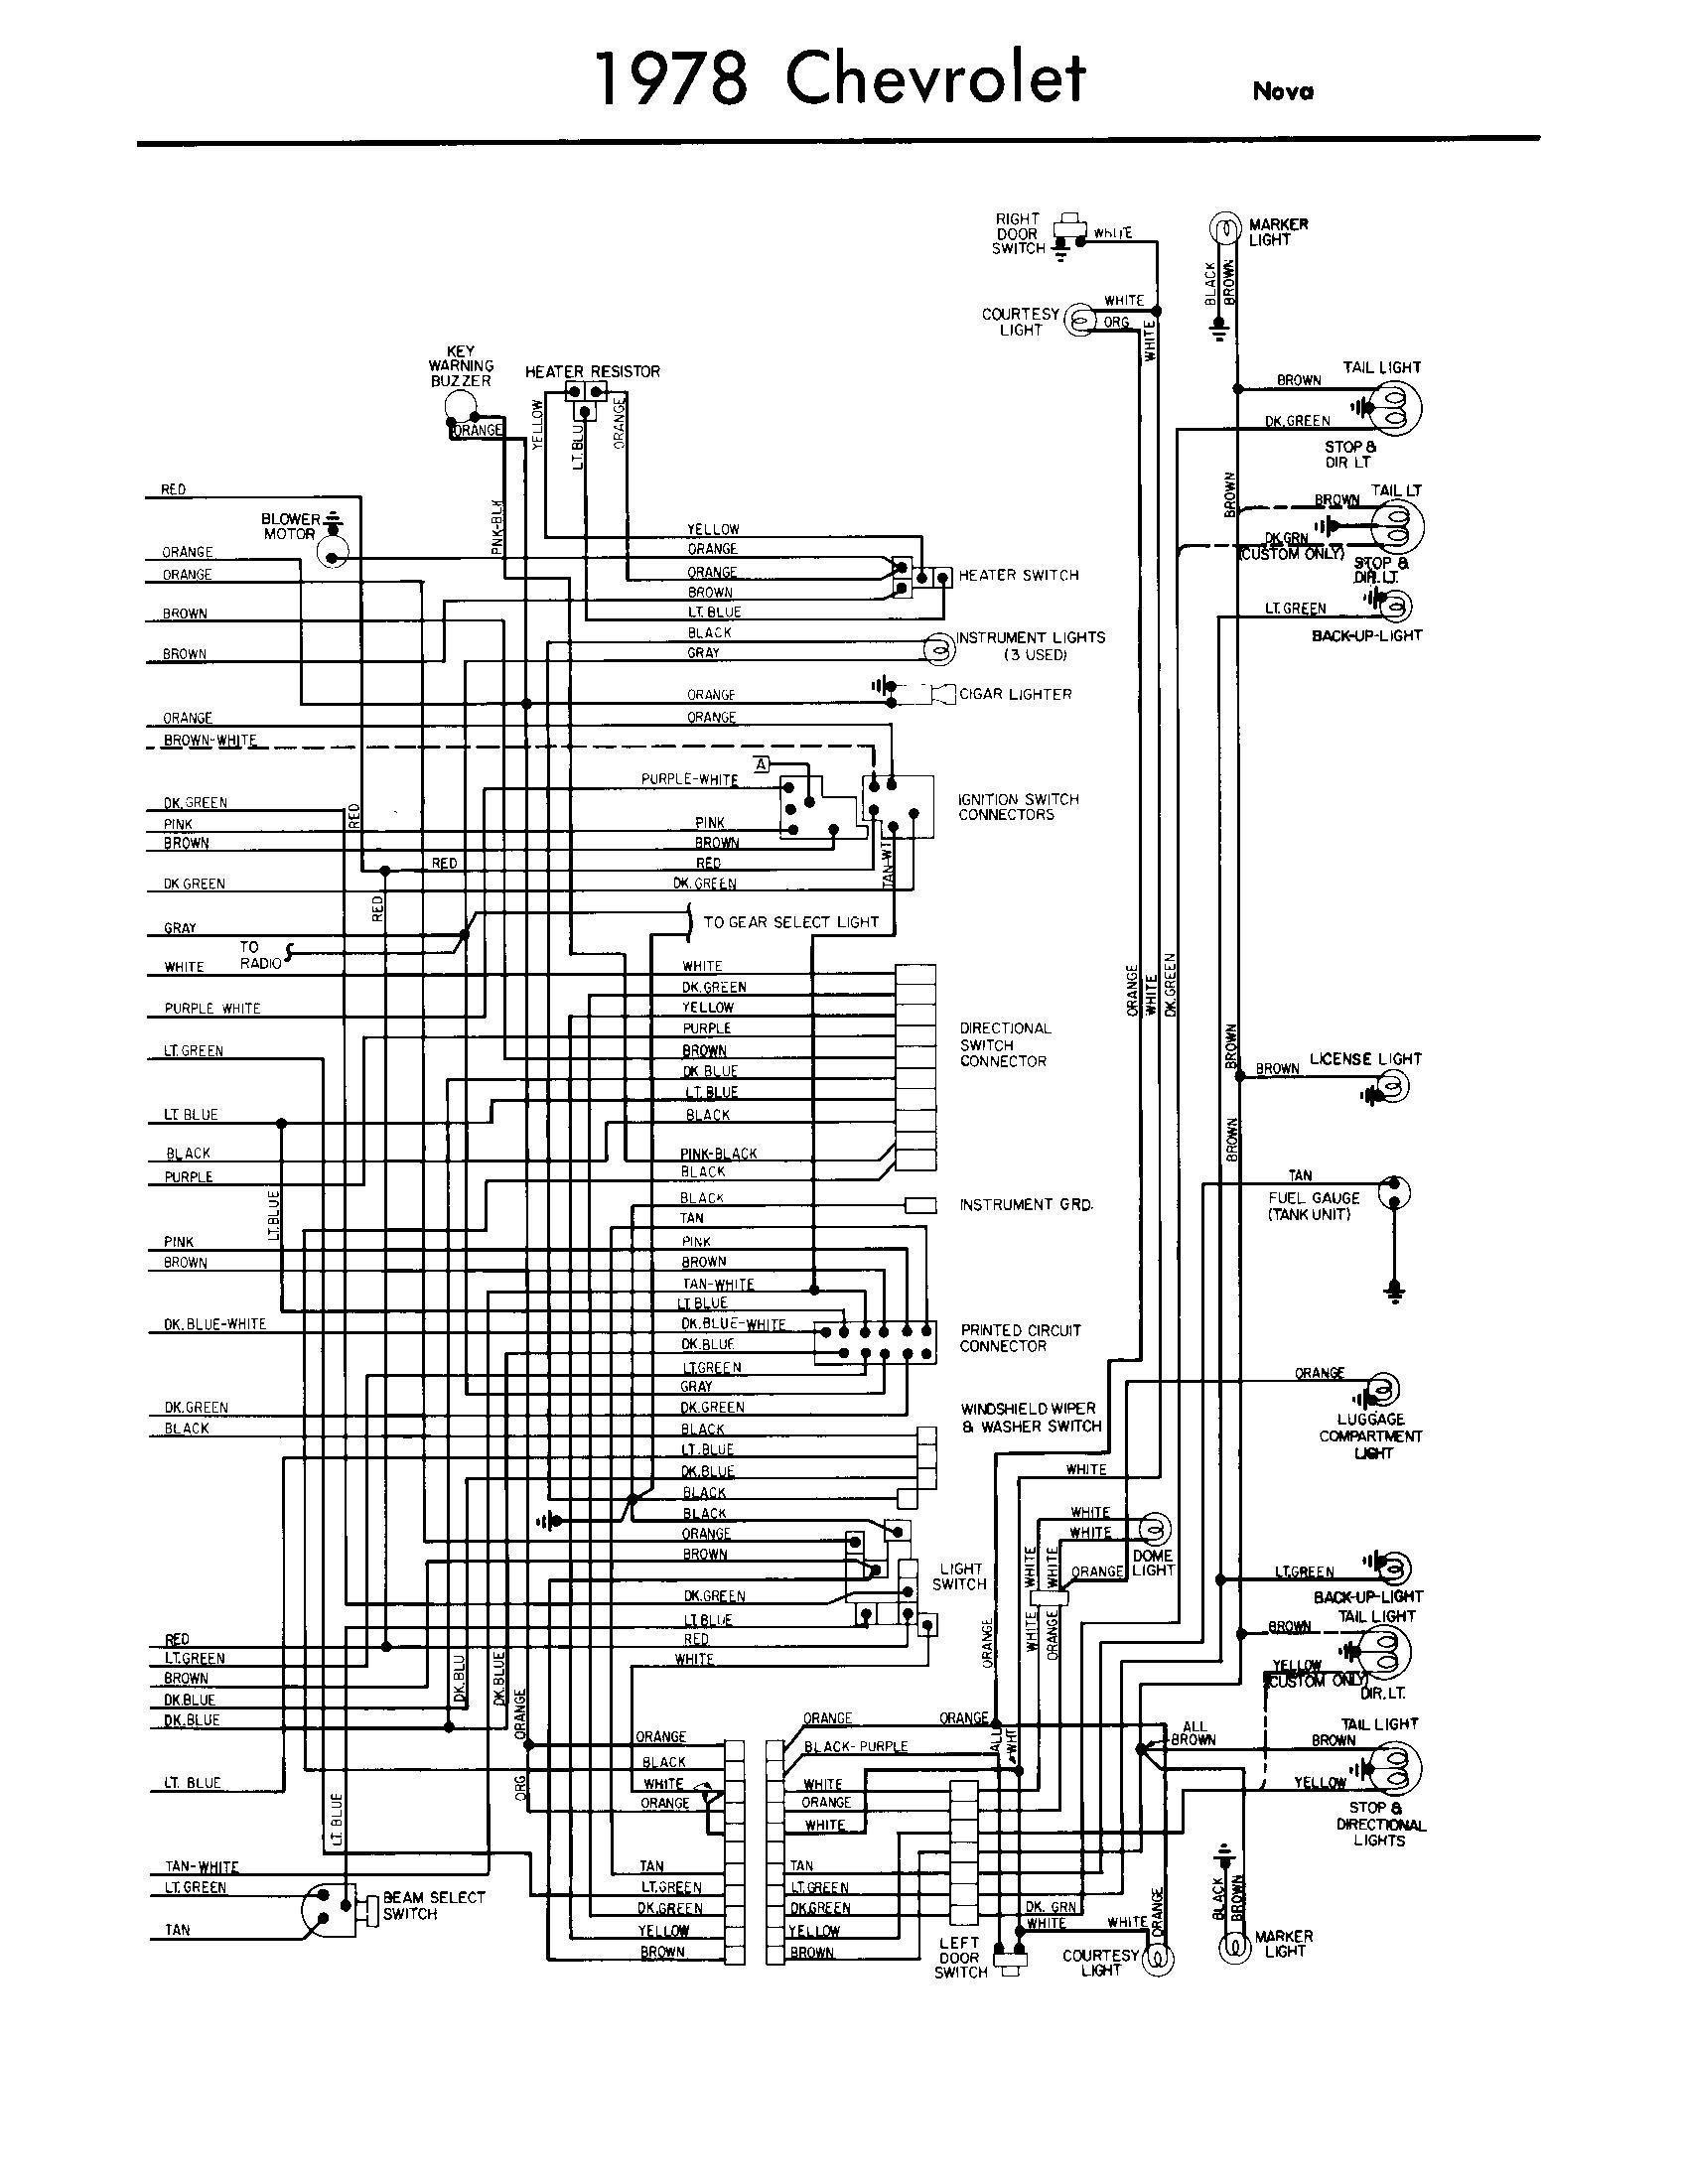 chevy vega wiring diagram yg 9512  air conditioning system diagram on 1984 chevy engine  air conditioning system diagram on 1984